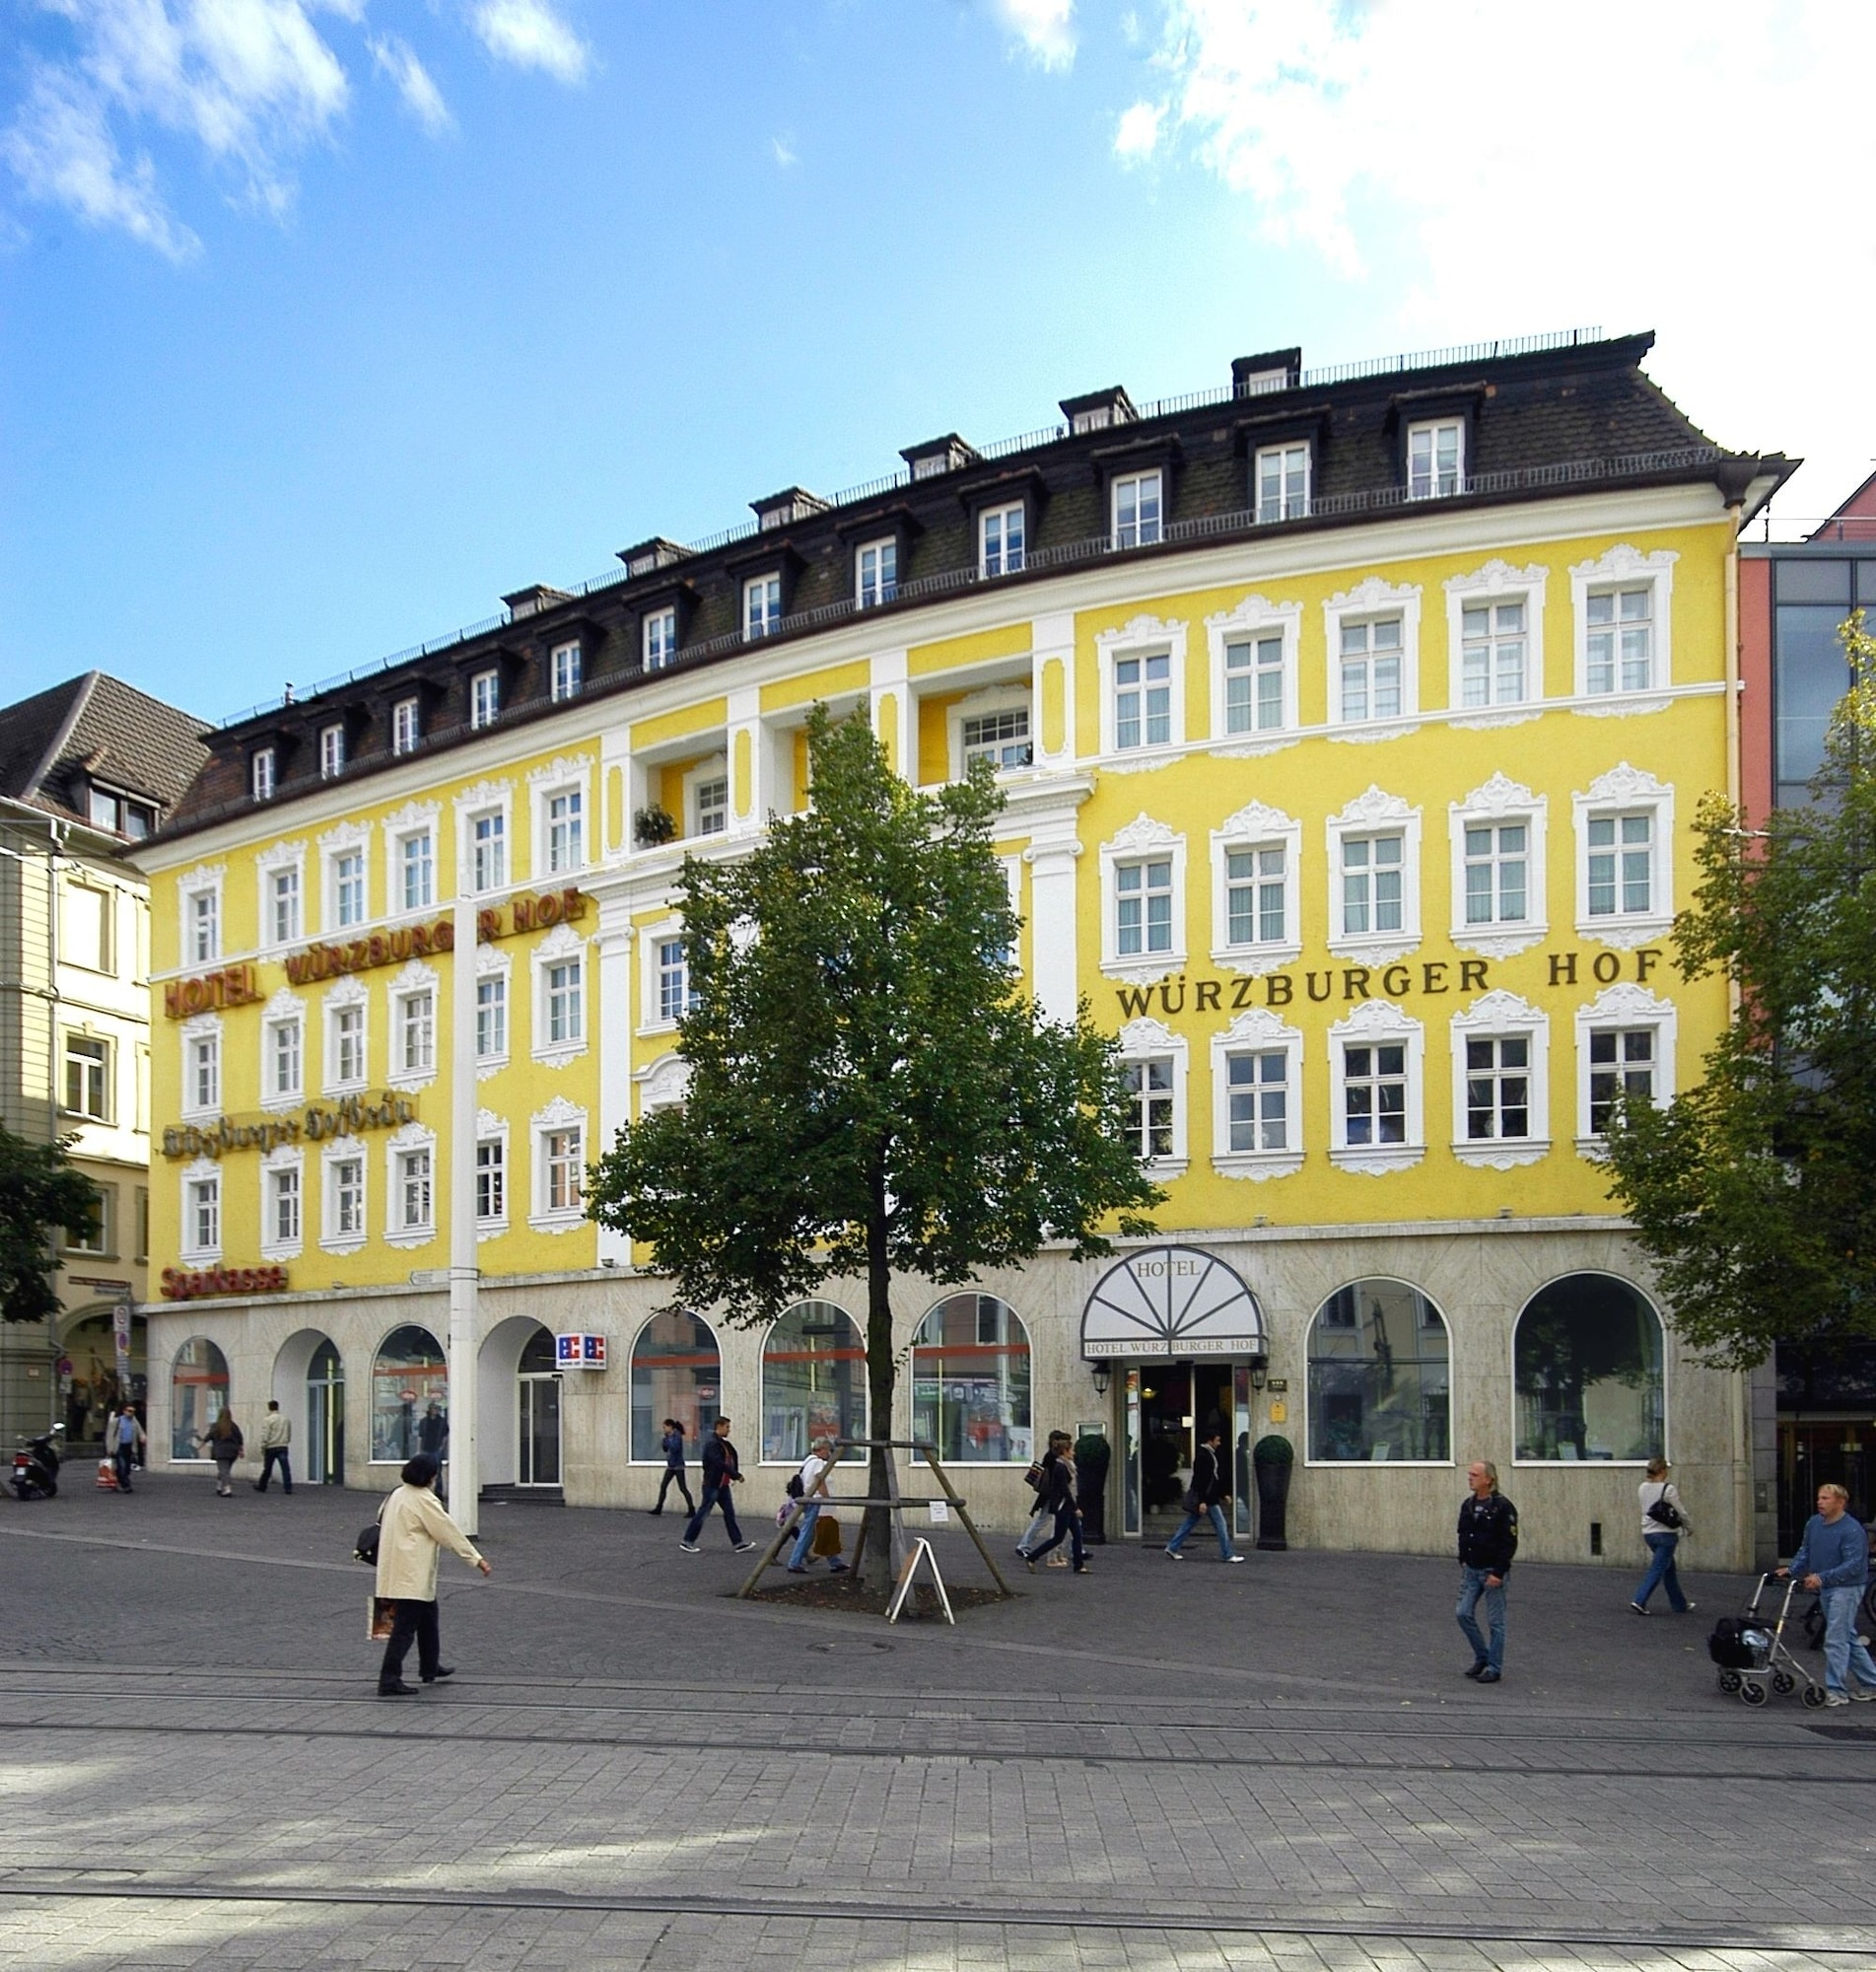 Hotel Würzburger Hof, Würzburg